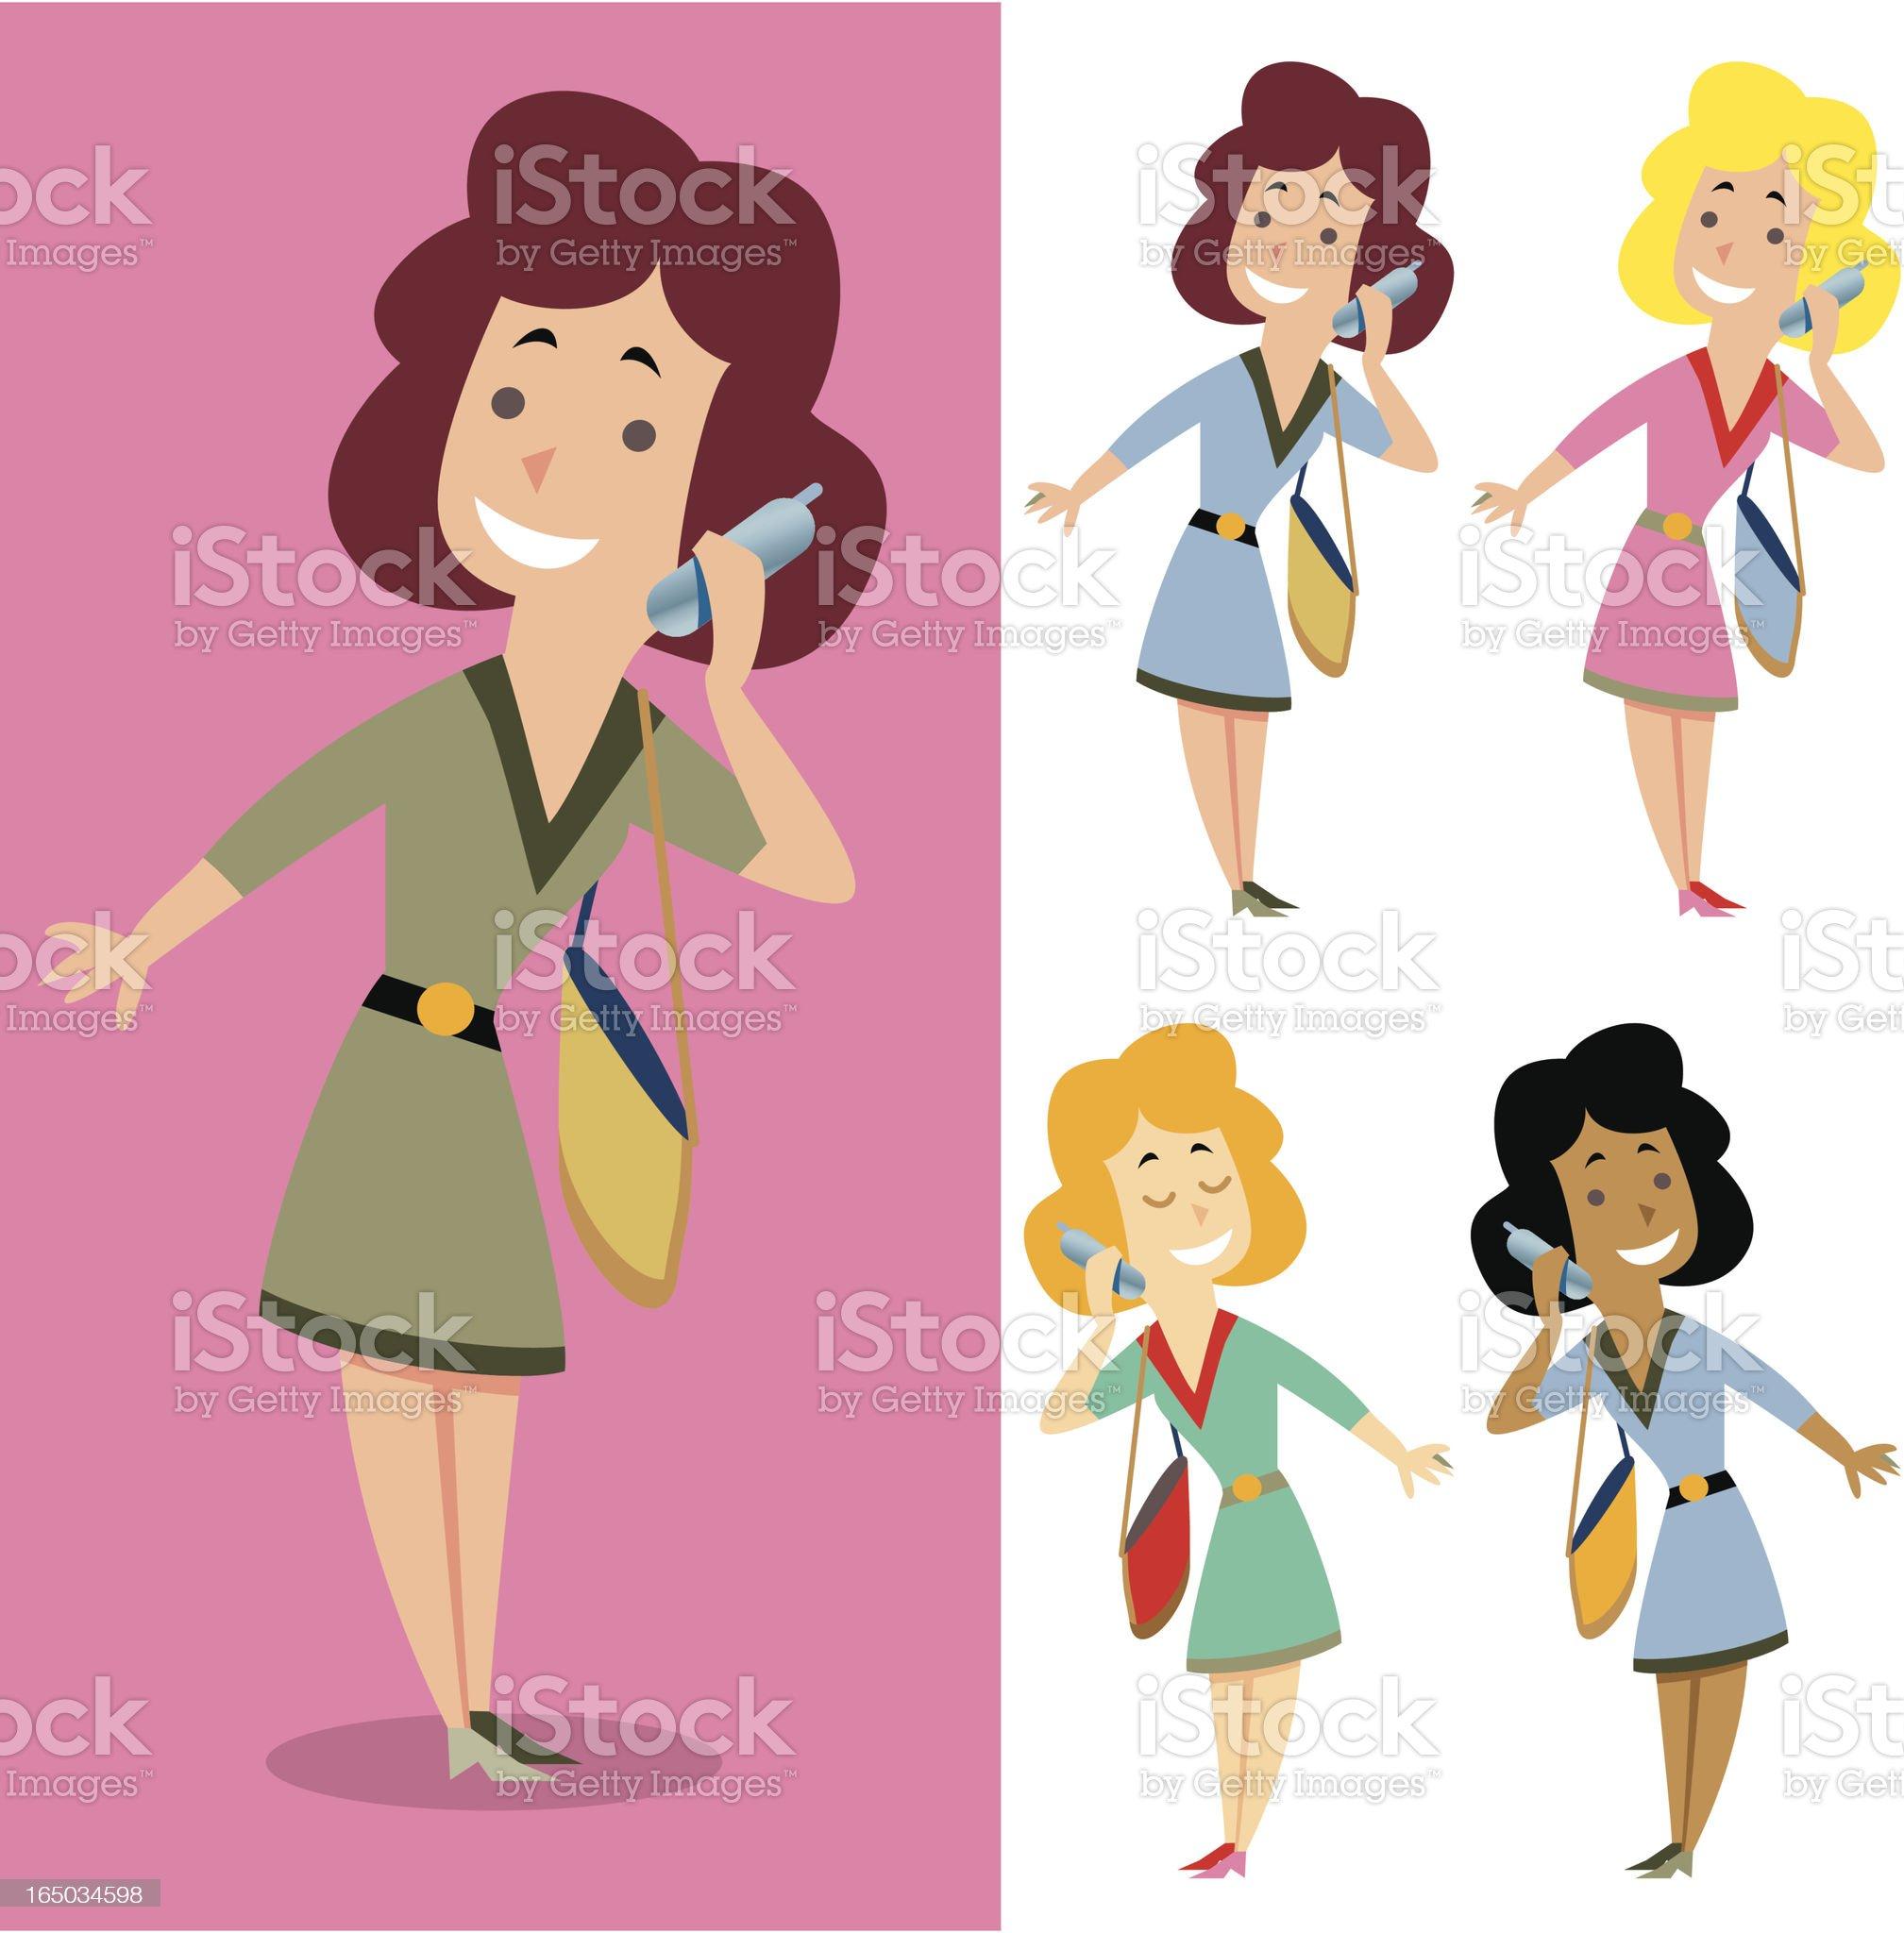 Mobile girl royalty-free stock vector art